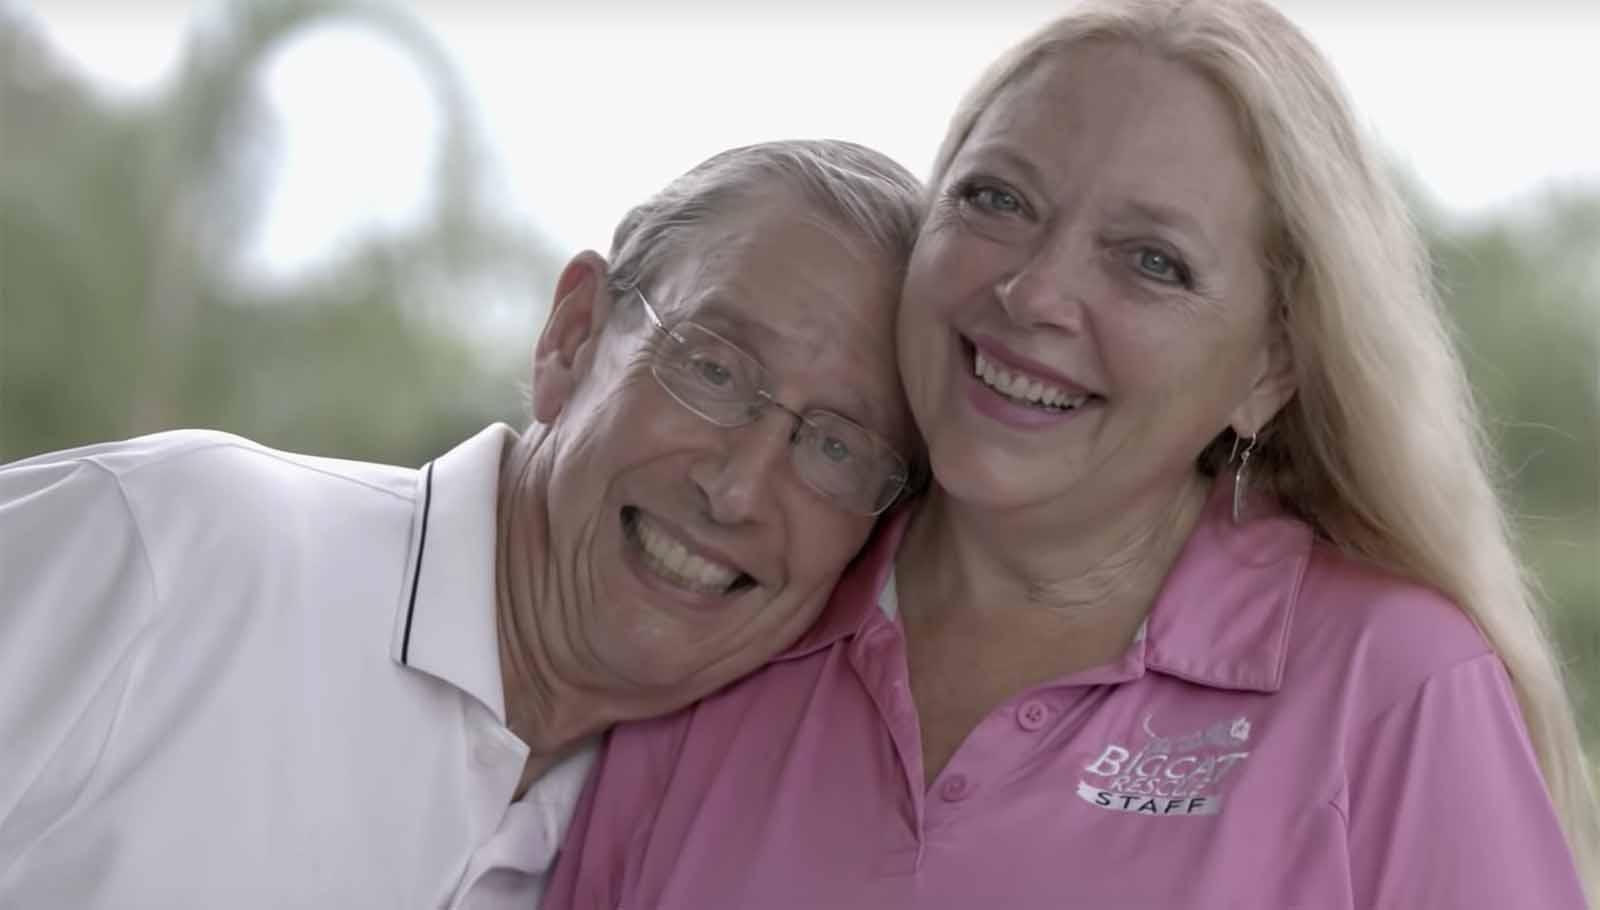 Here S Why The Internet Thinks Carole Baskin Killed Her Husband Film Daily